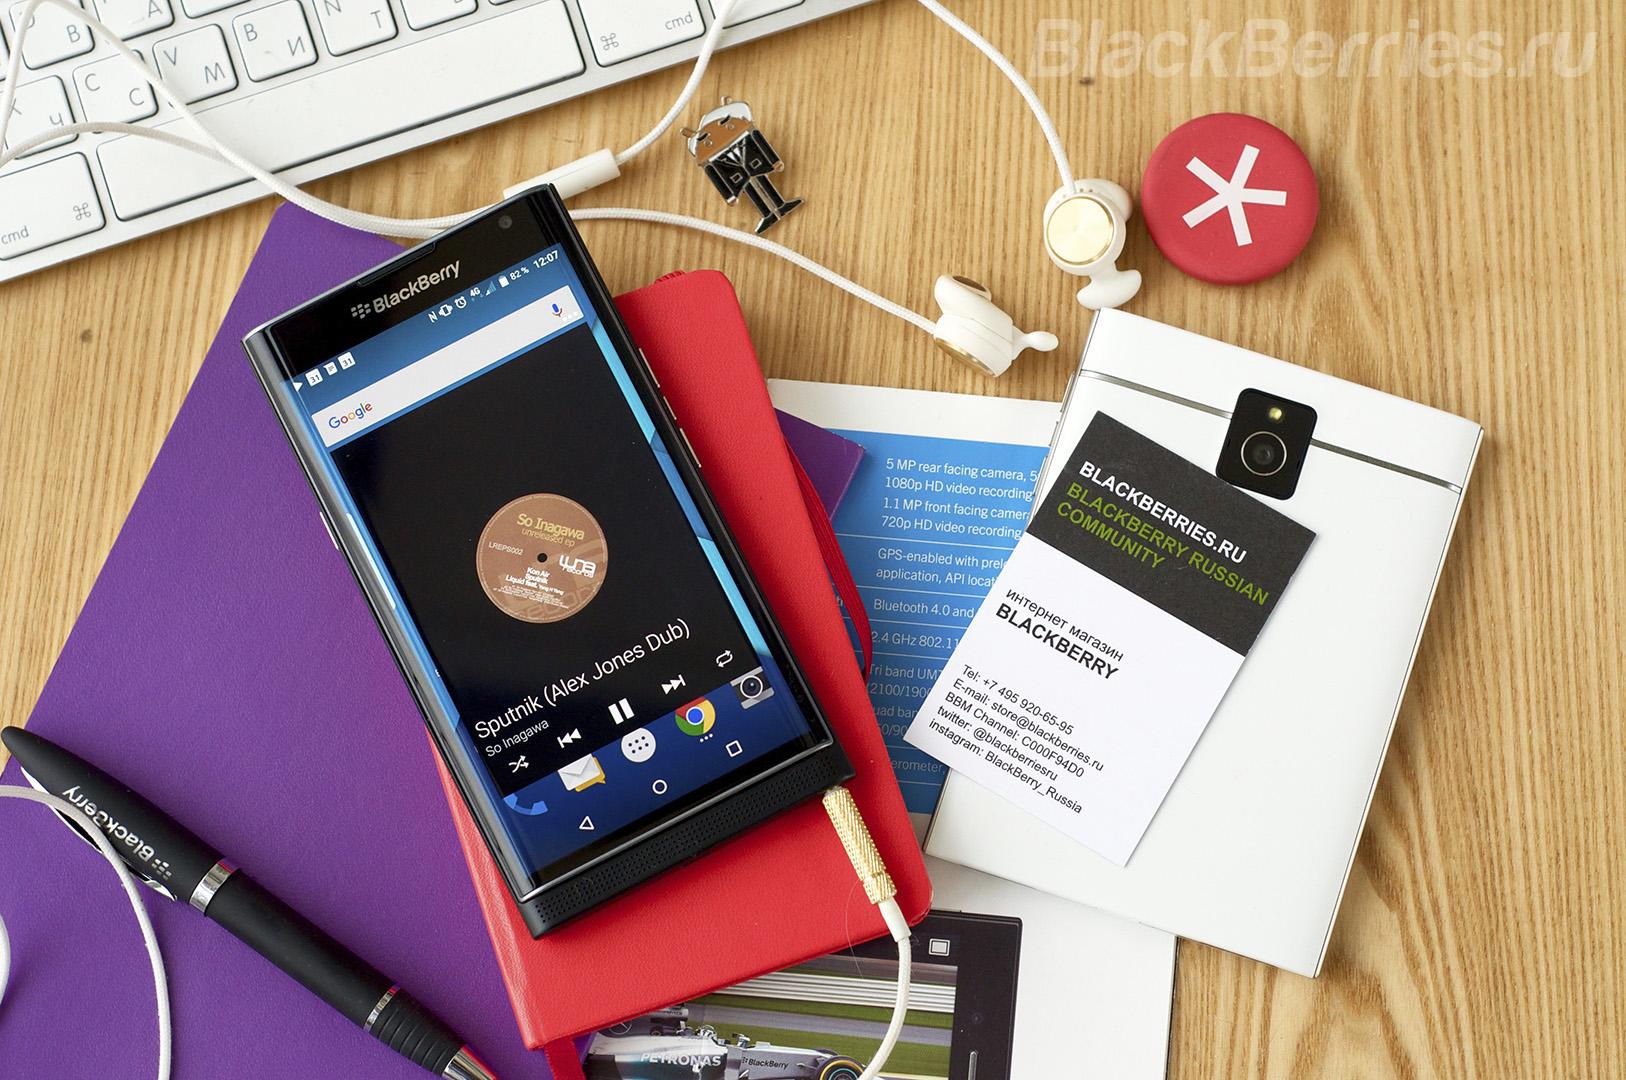 BlackBerry-Priv-Review-035